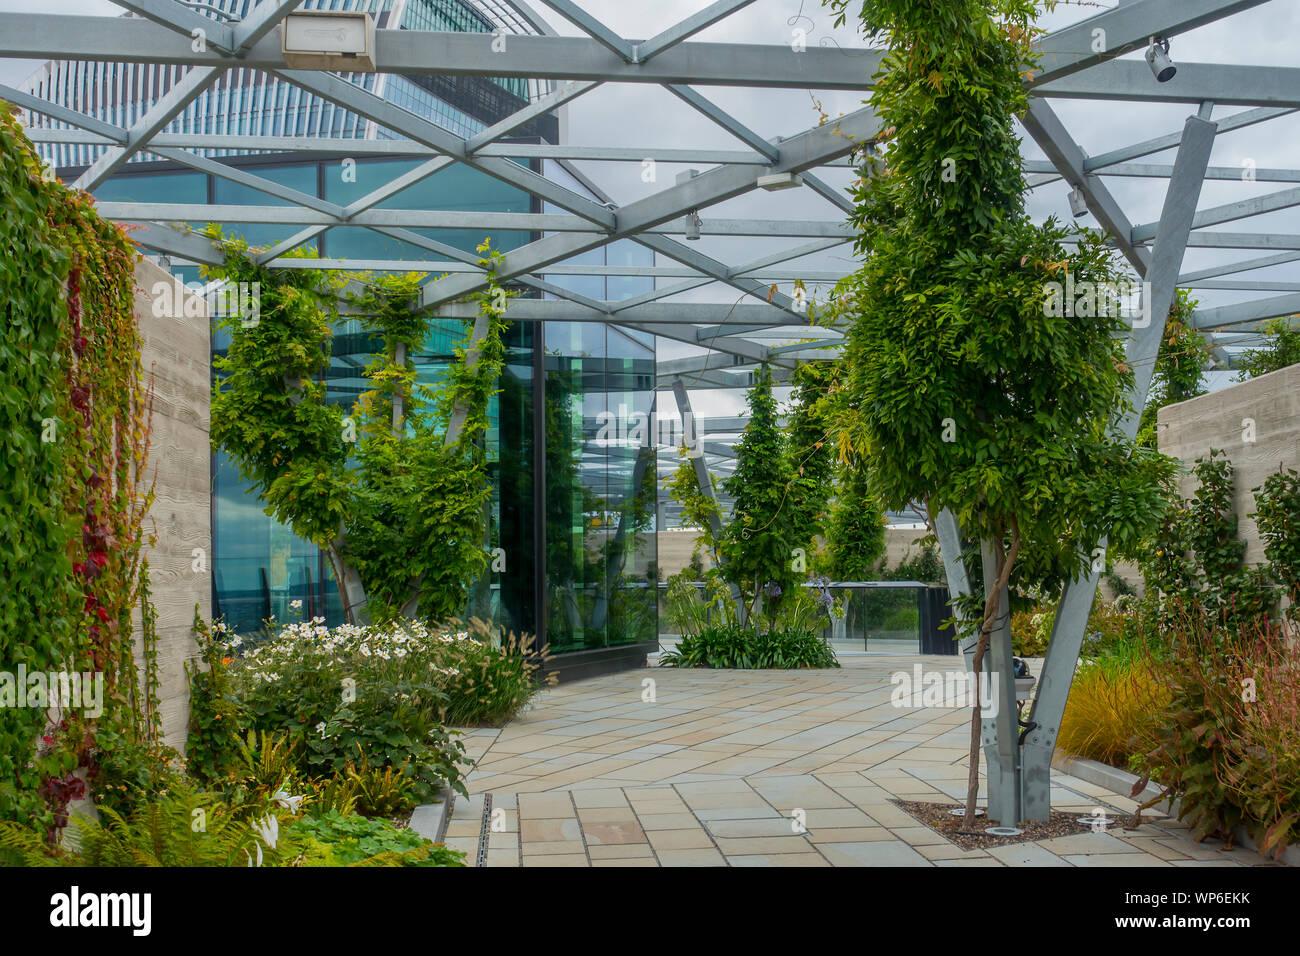 Fen Court Garden,Rooftop Garden,The Garden At 120,Fenchurch Street,London,England Stock Photo - Alamy